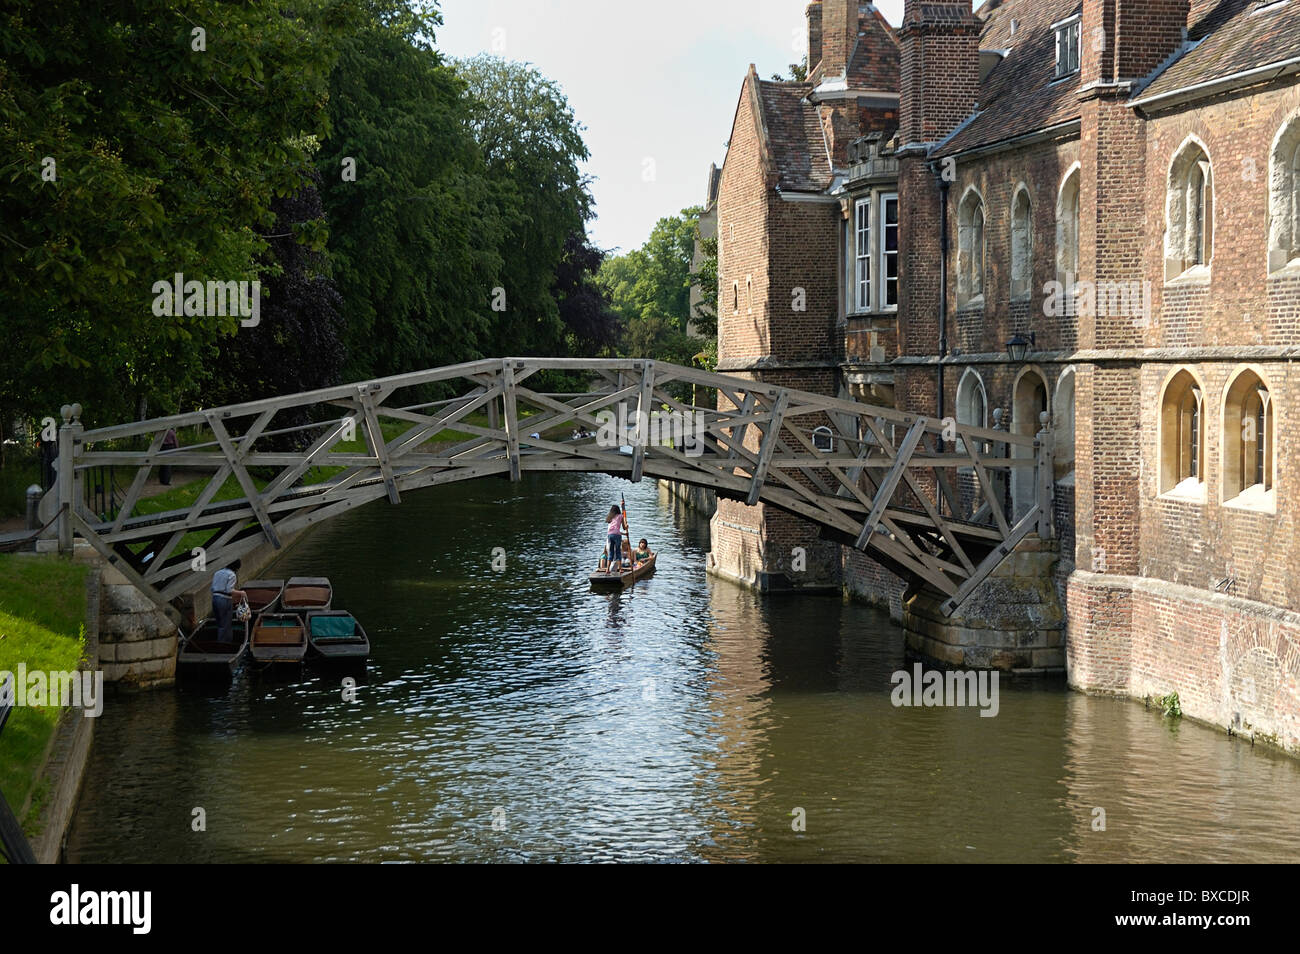 Mathematical Bridge, Punters on the Cam River; Cambridge, England; 070601_6272 - Stock Image